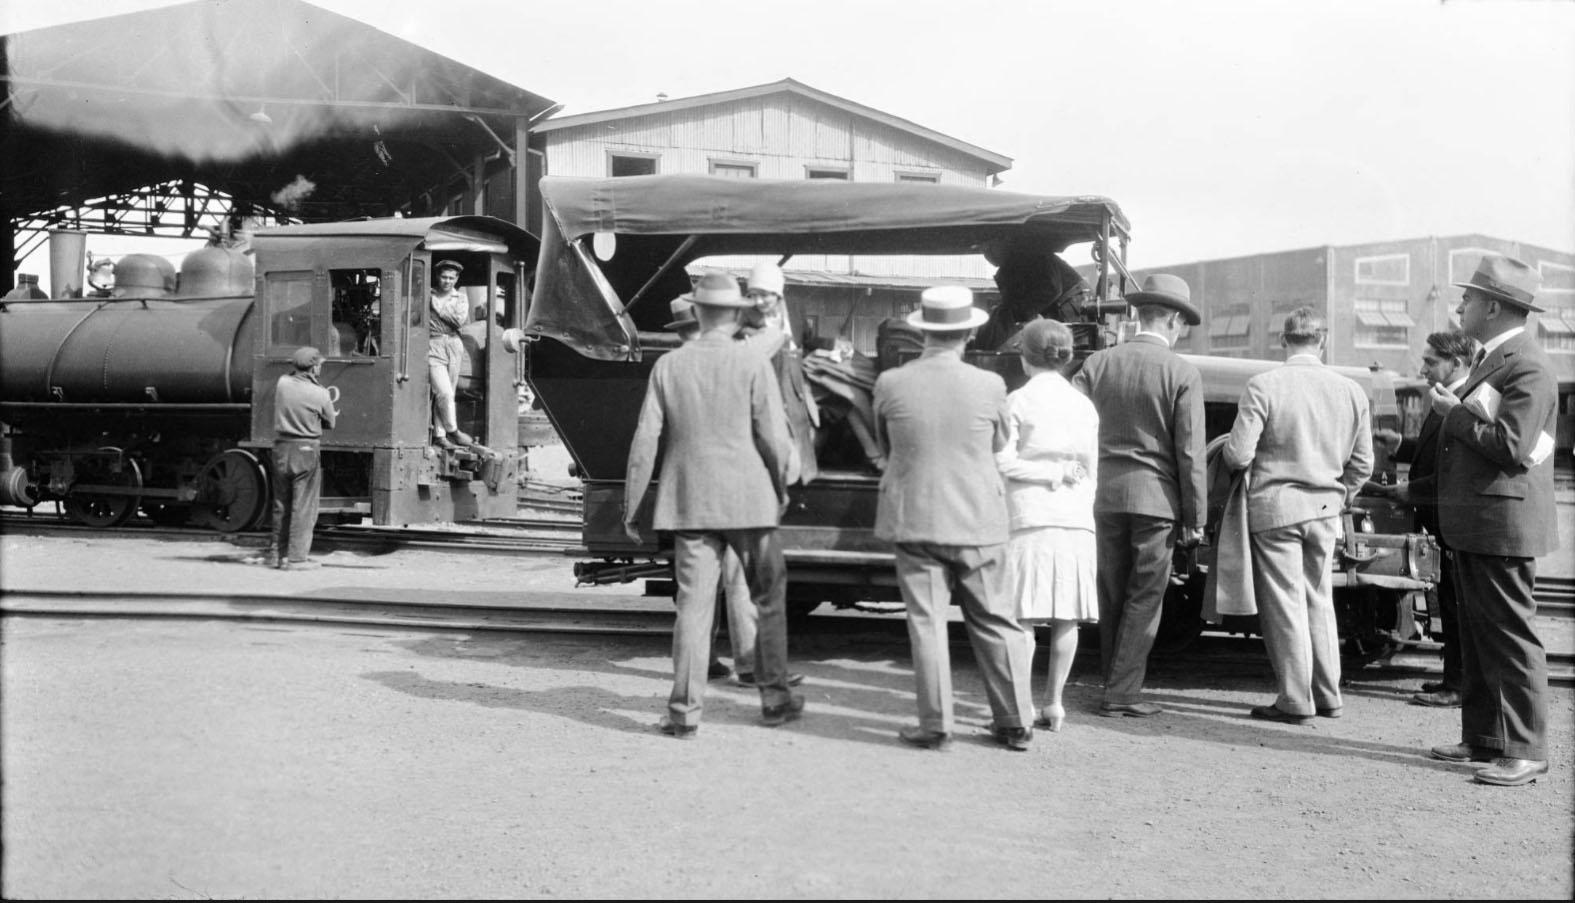 Enterreno - Fotos históricas de chile - fotos antiguas de Chile - Rancagua en 1930